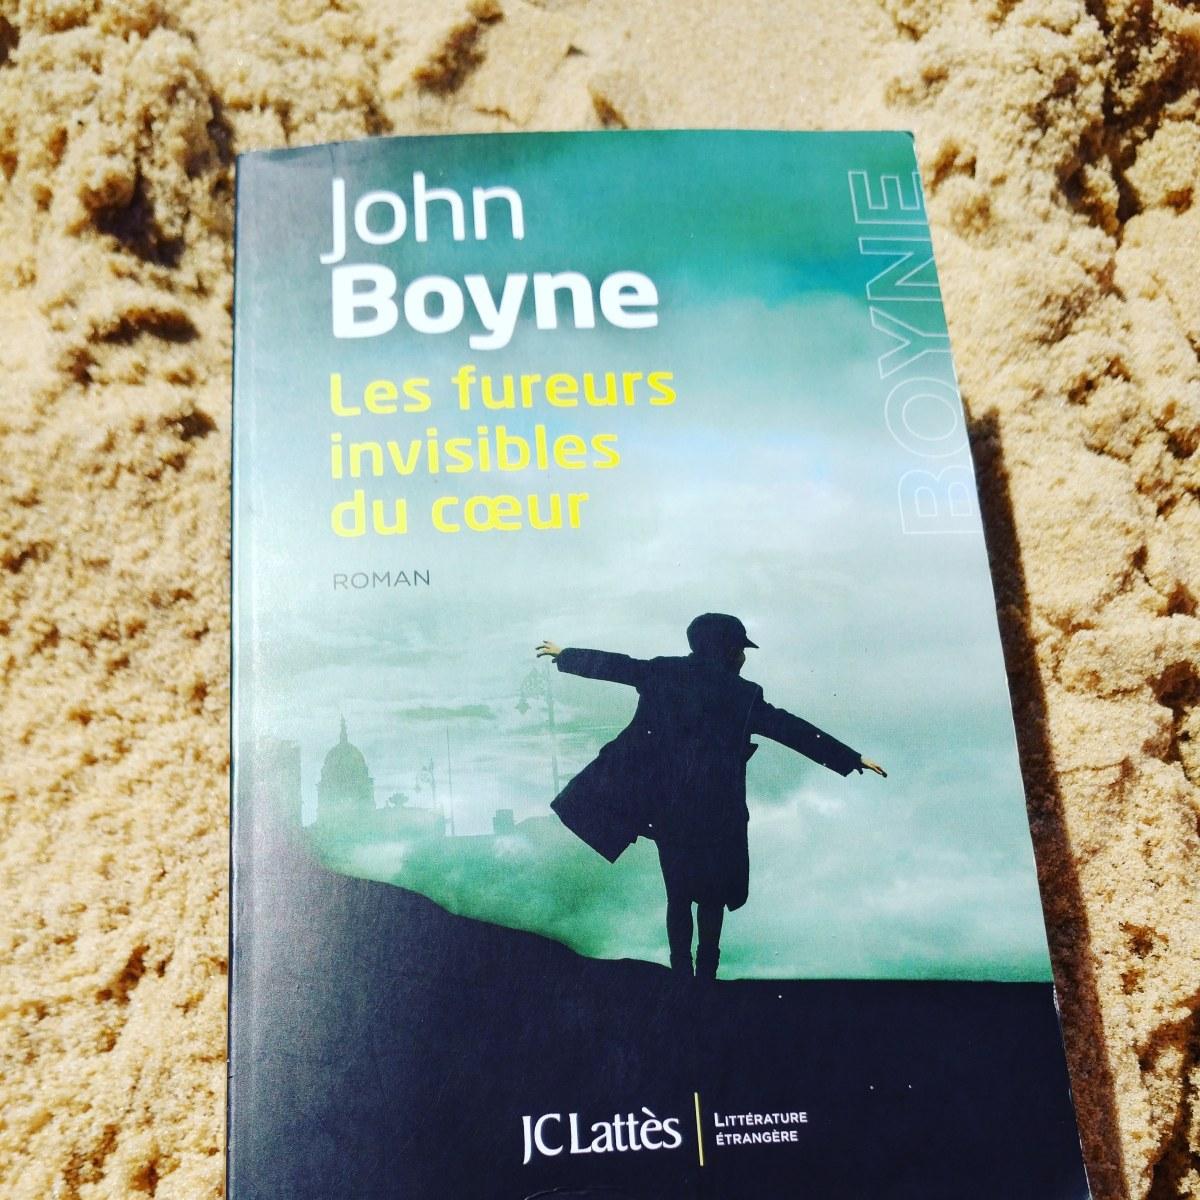 Les fureurs invisibles du coeur, John Boyne